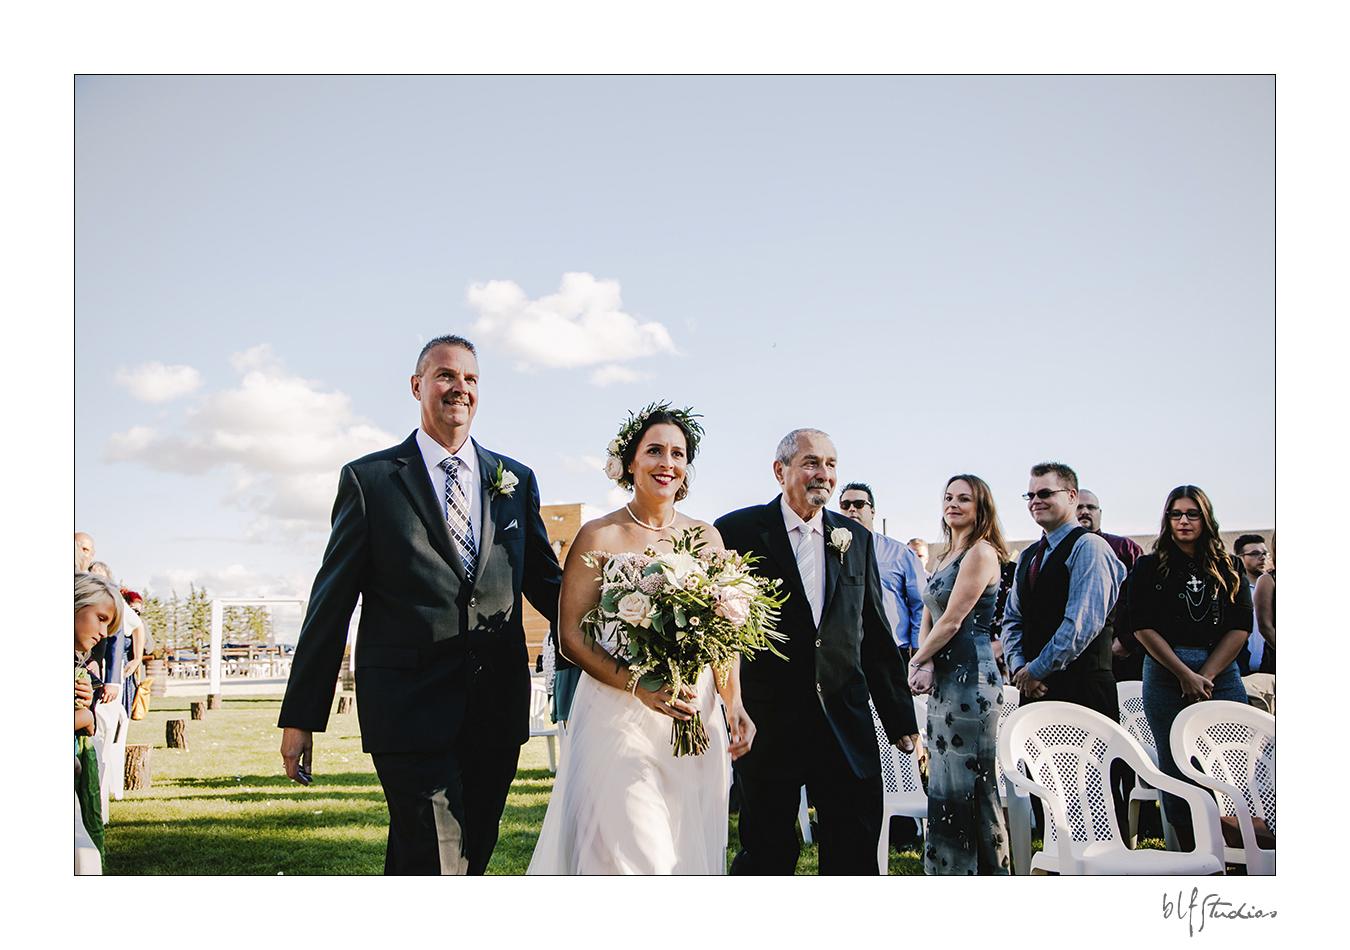 Wedding photos Hitch 'n Post Winnipeg